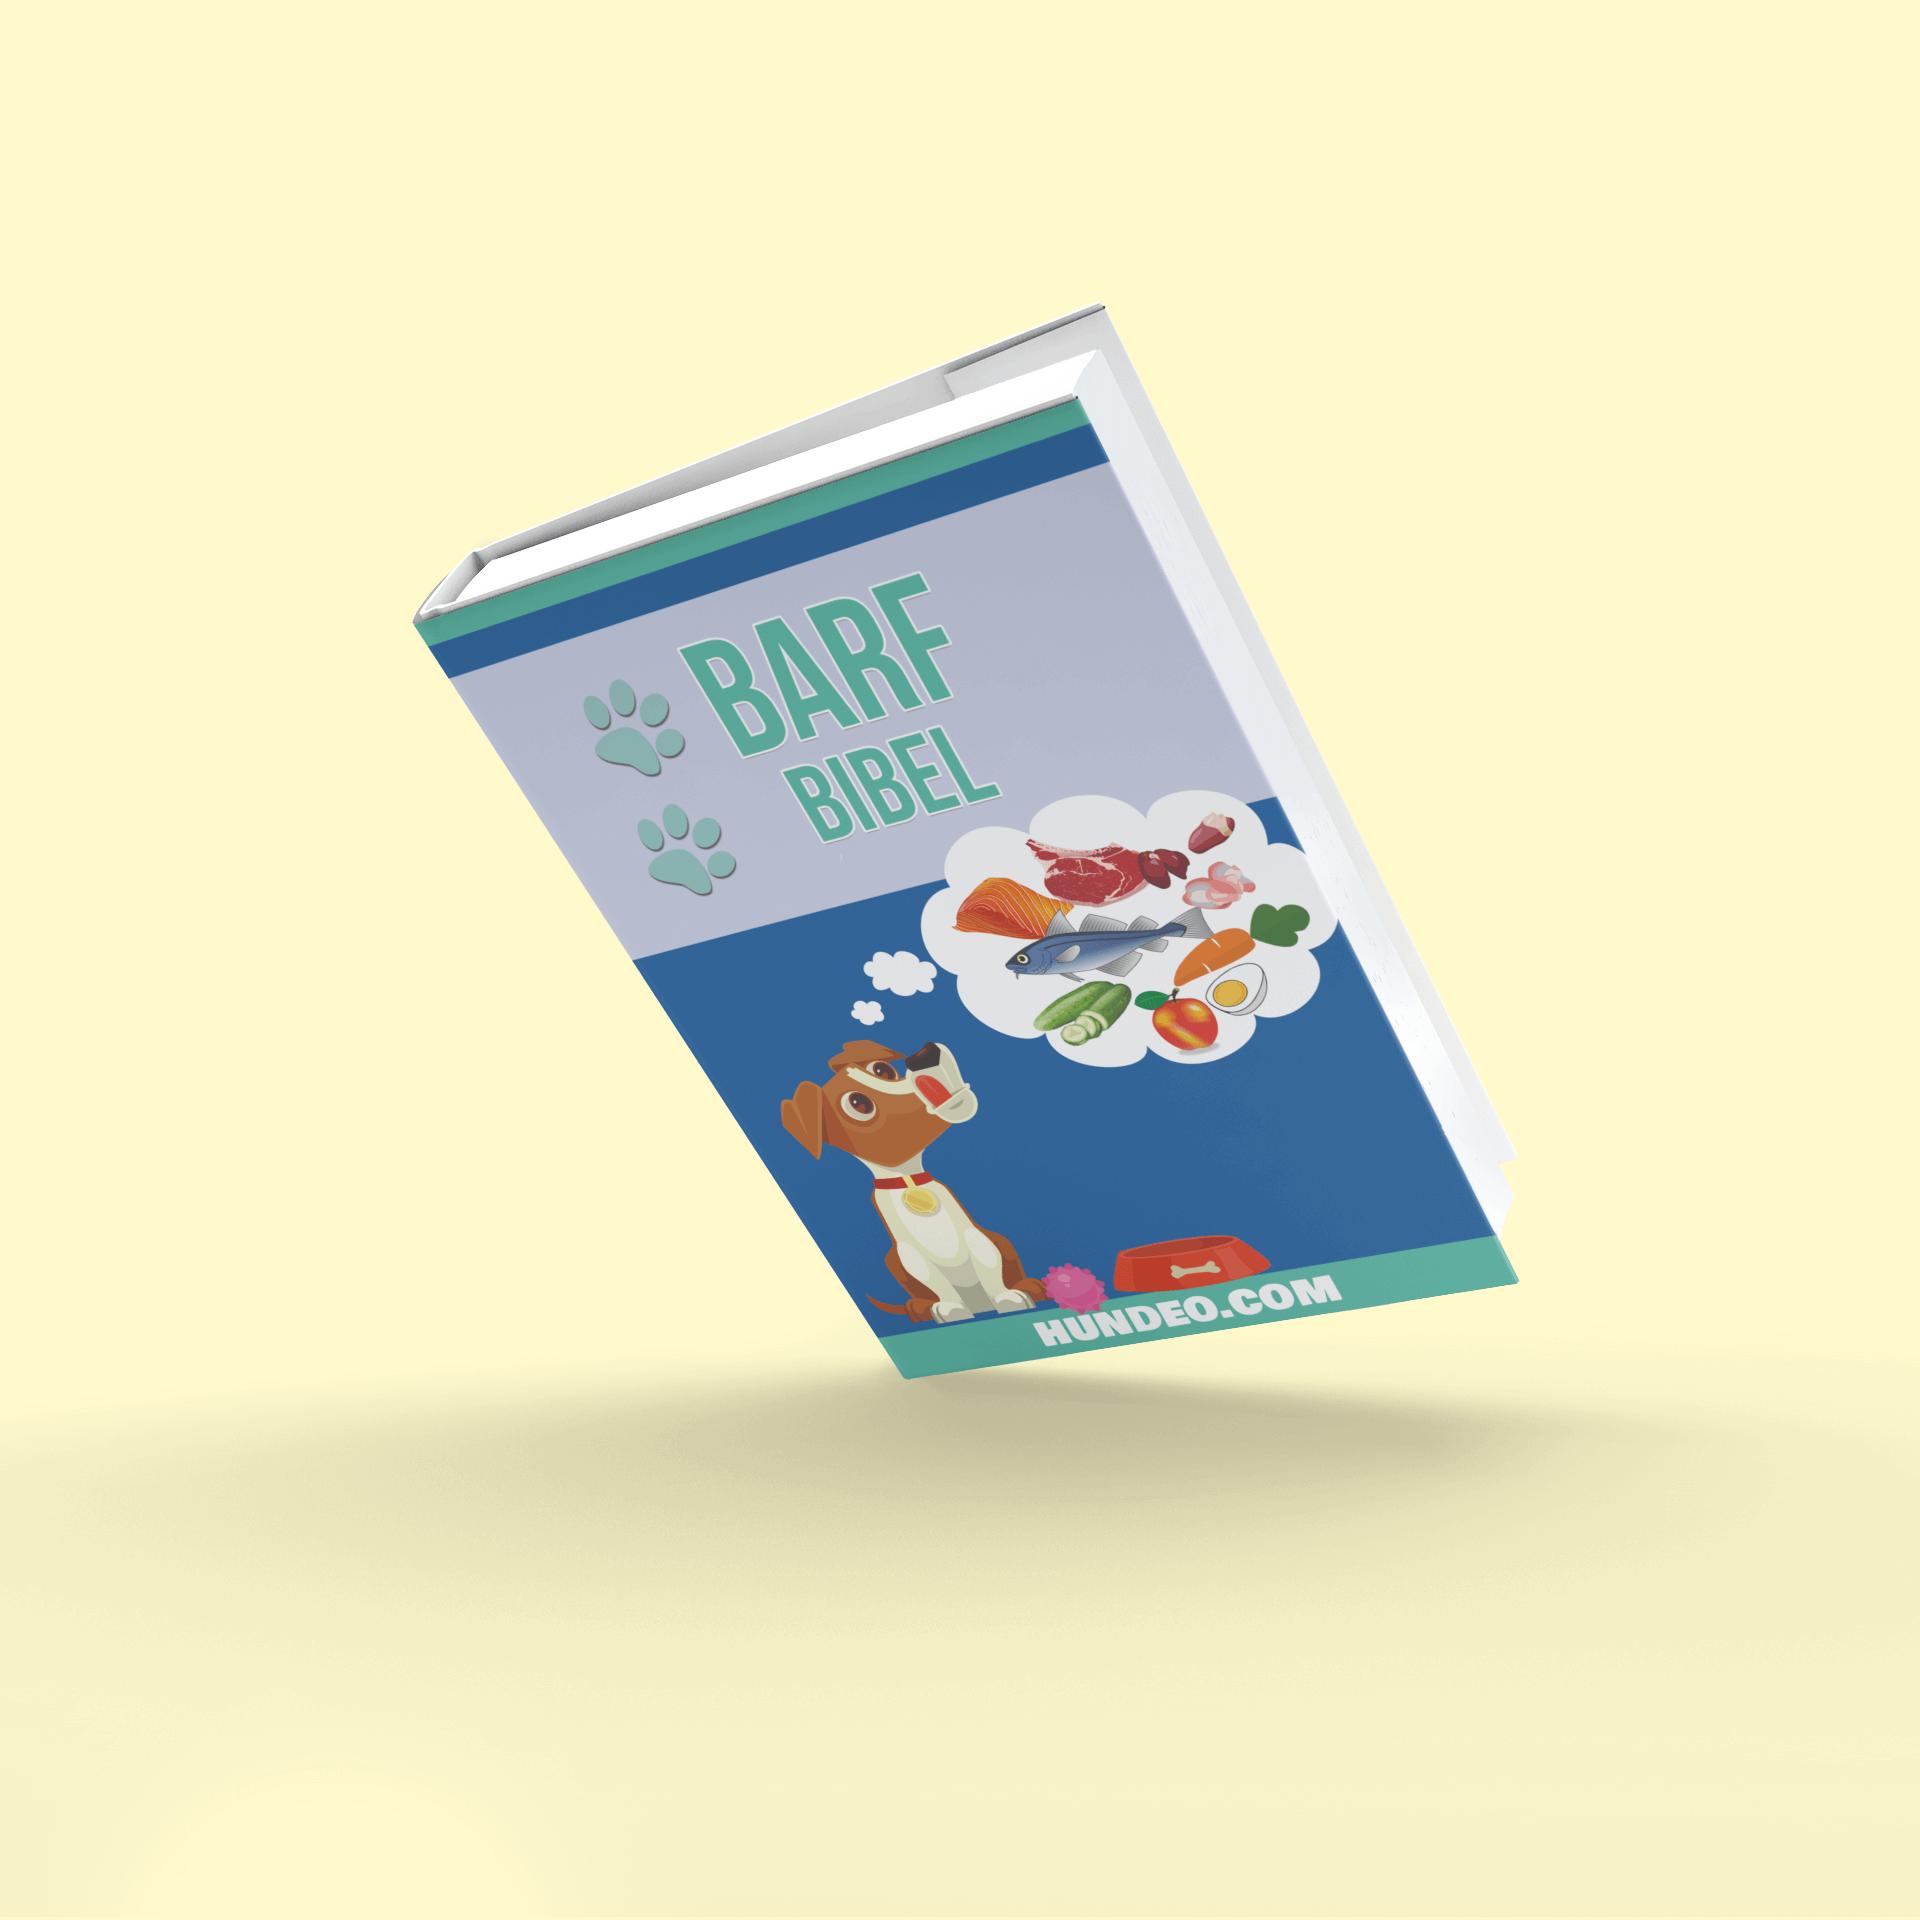 Barf Bibel Partnerprogramm 12